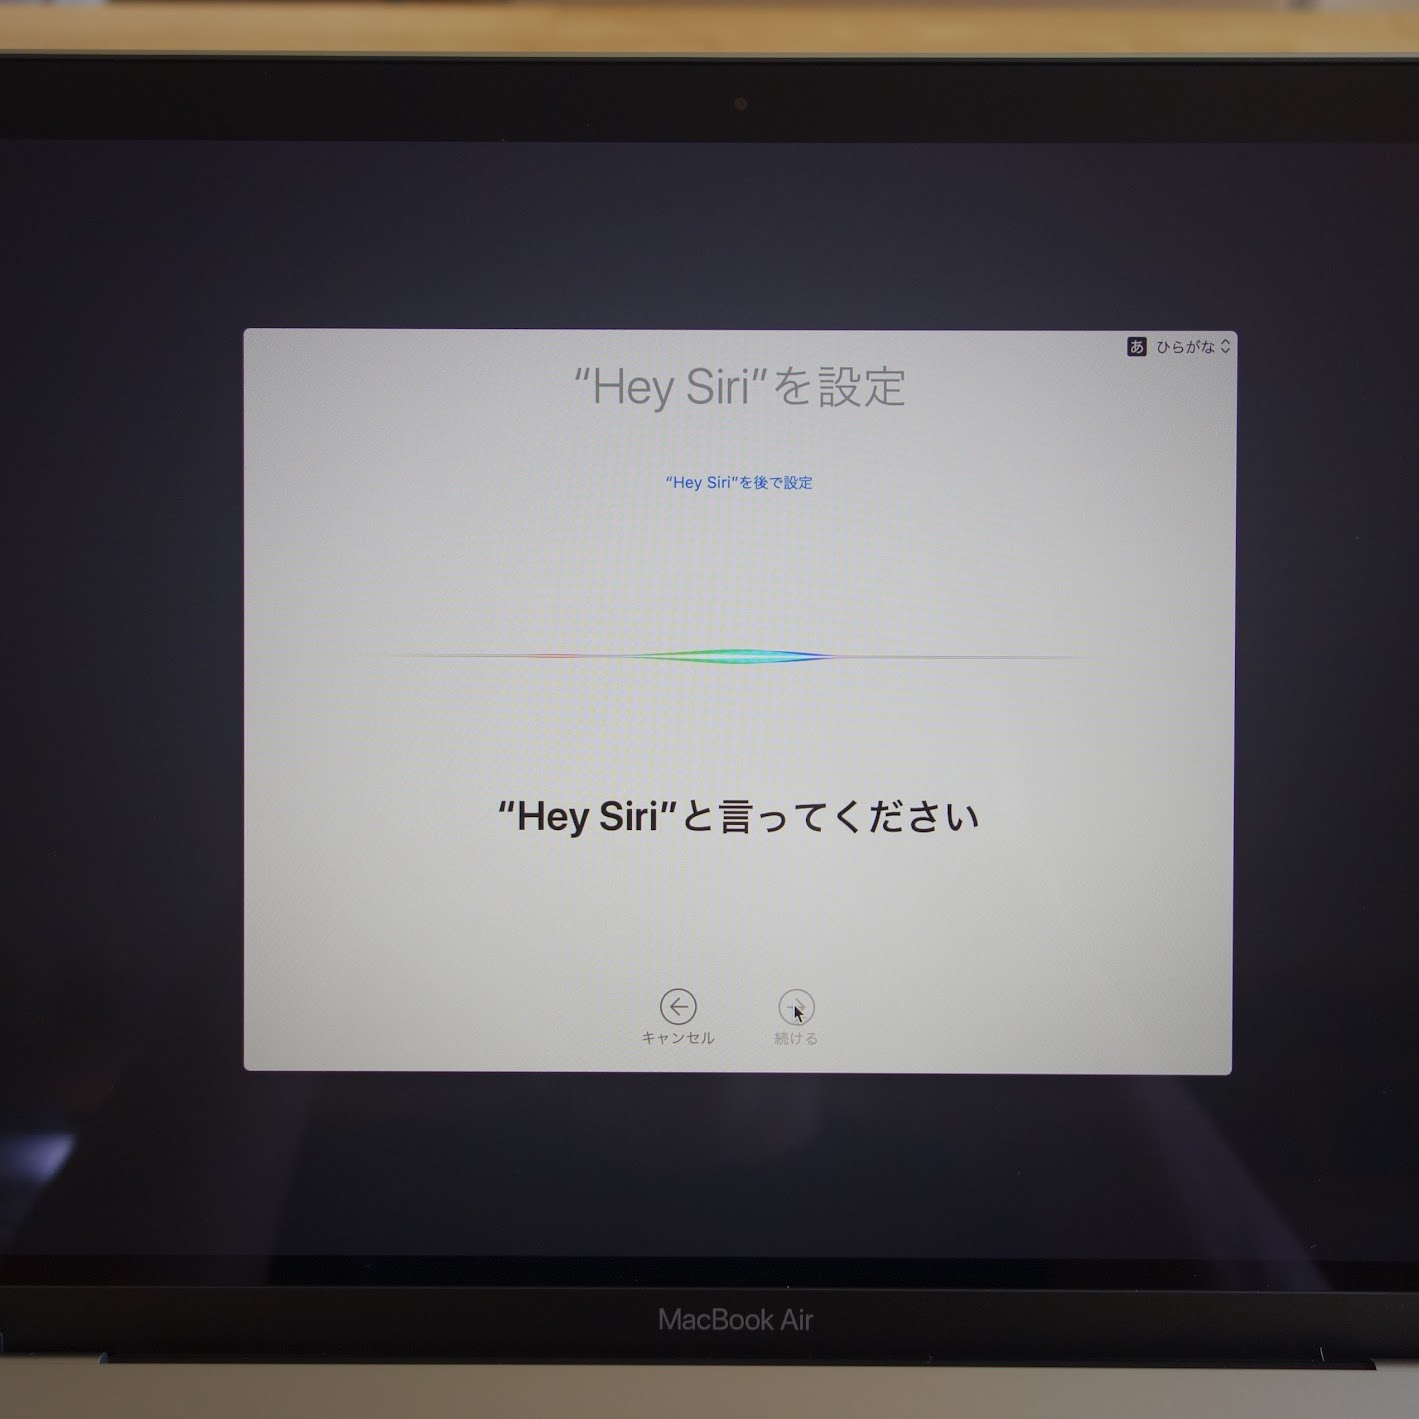 MacBook Air Hey Siri